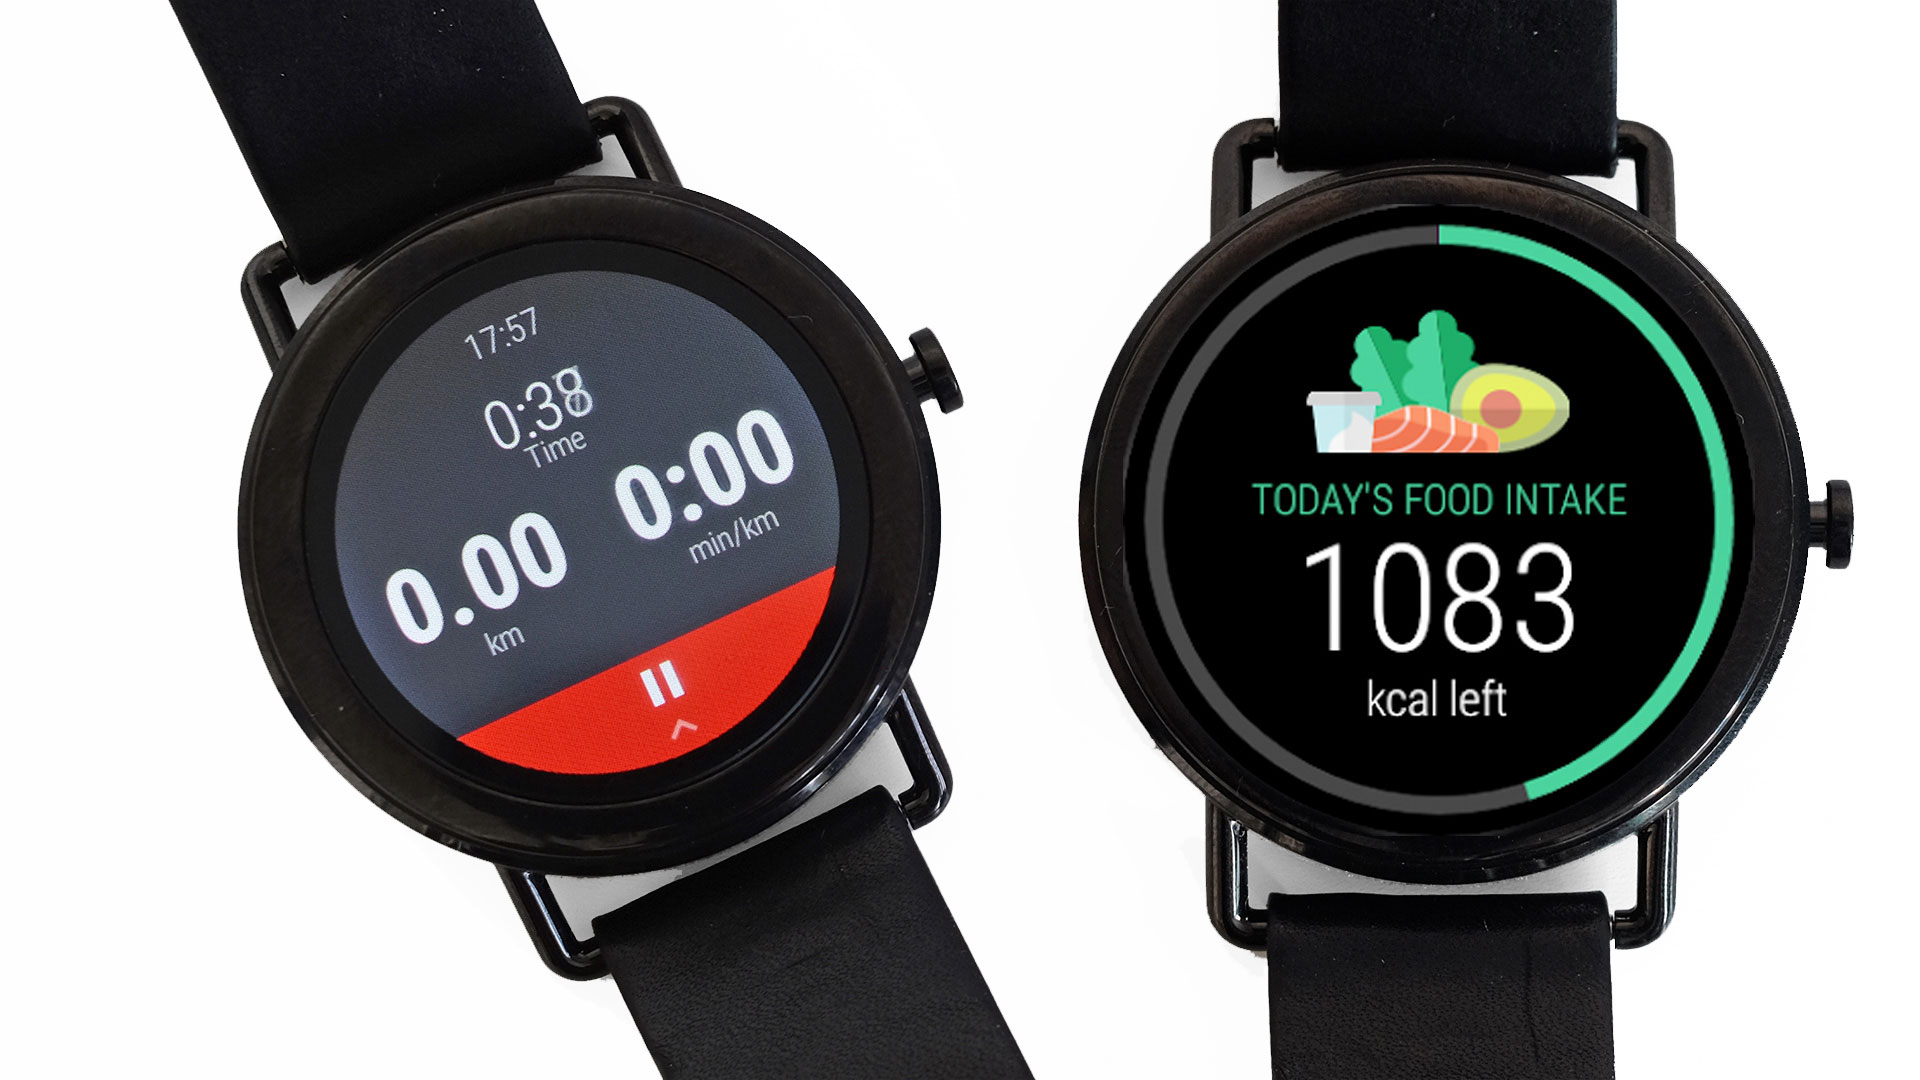 f7afcd15062bff Best Wear OS apps for your smartwatch in 2019 | TechRadar